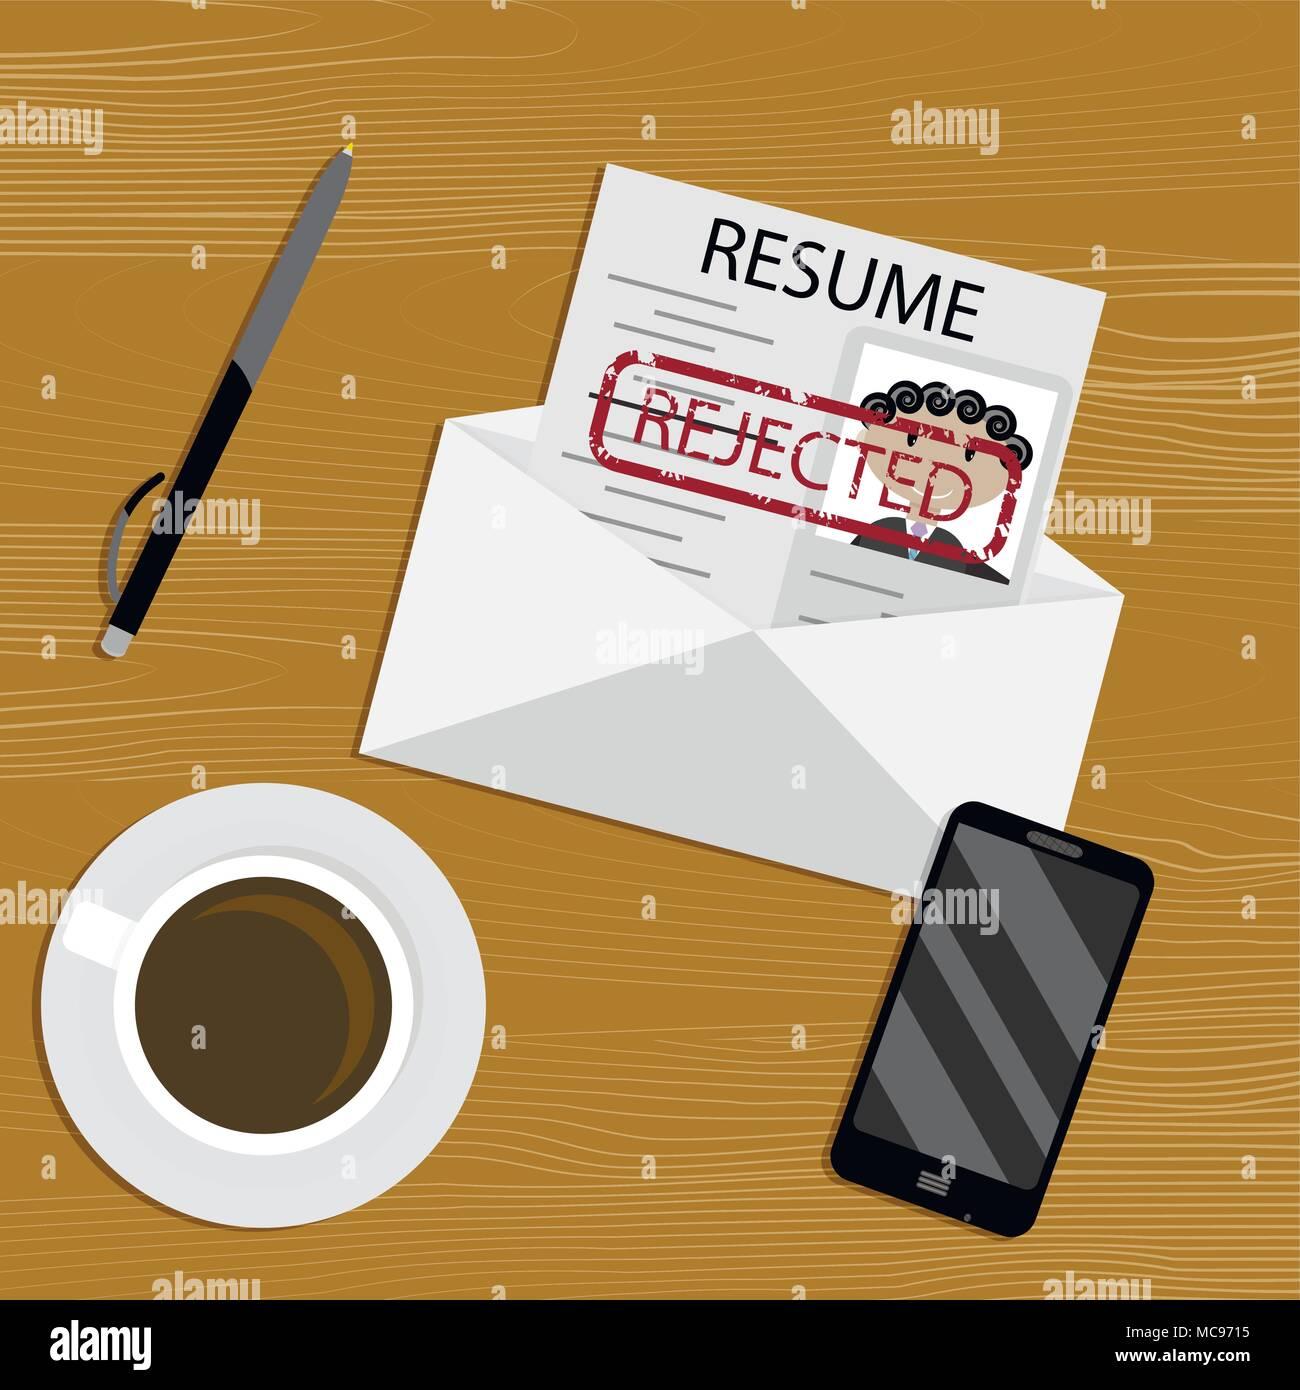 Rejected Job Concept Rejection Document Cv Employment Paper